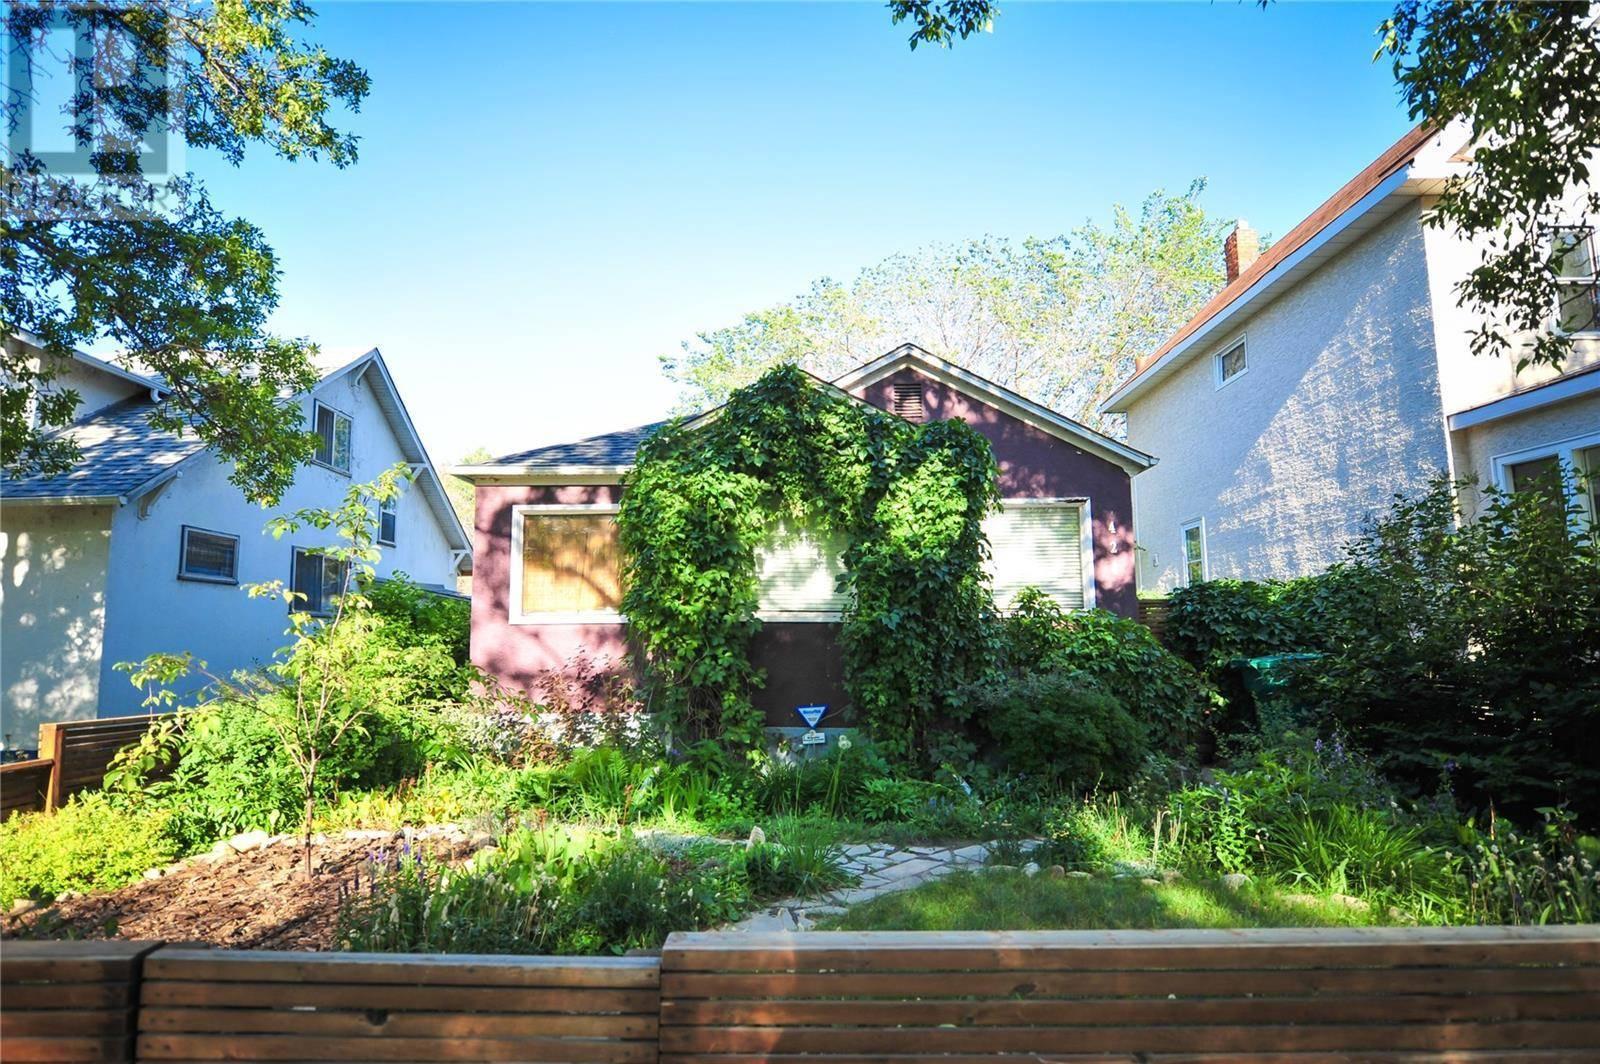 House for sale at 424 H Ave S Saskatoon Saskatchewan - MLS: SK783570